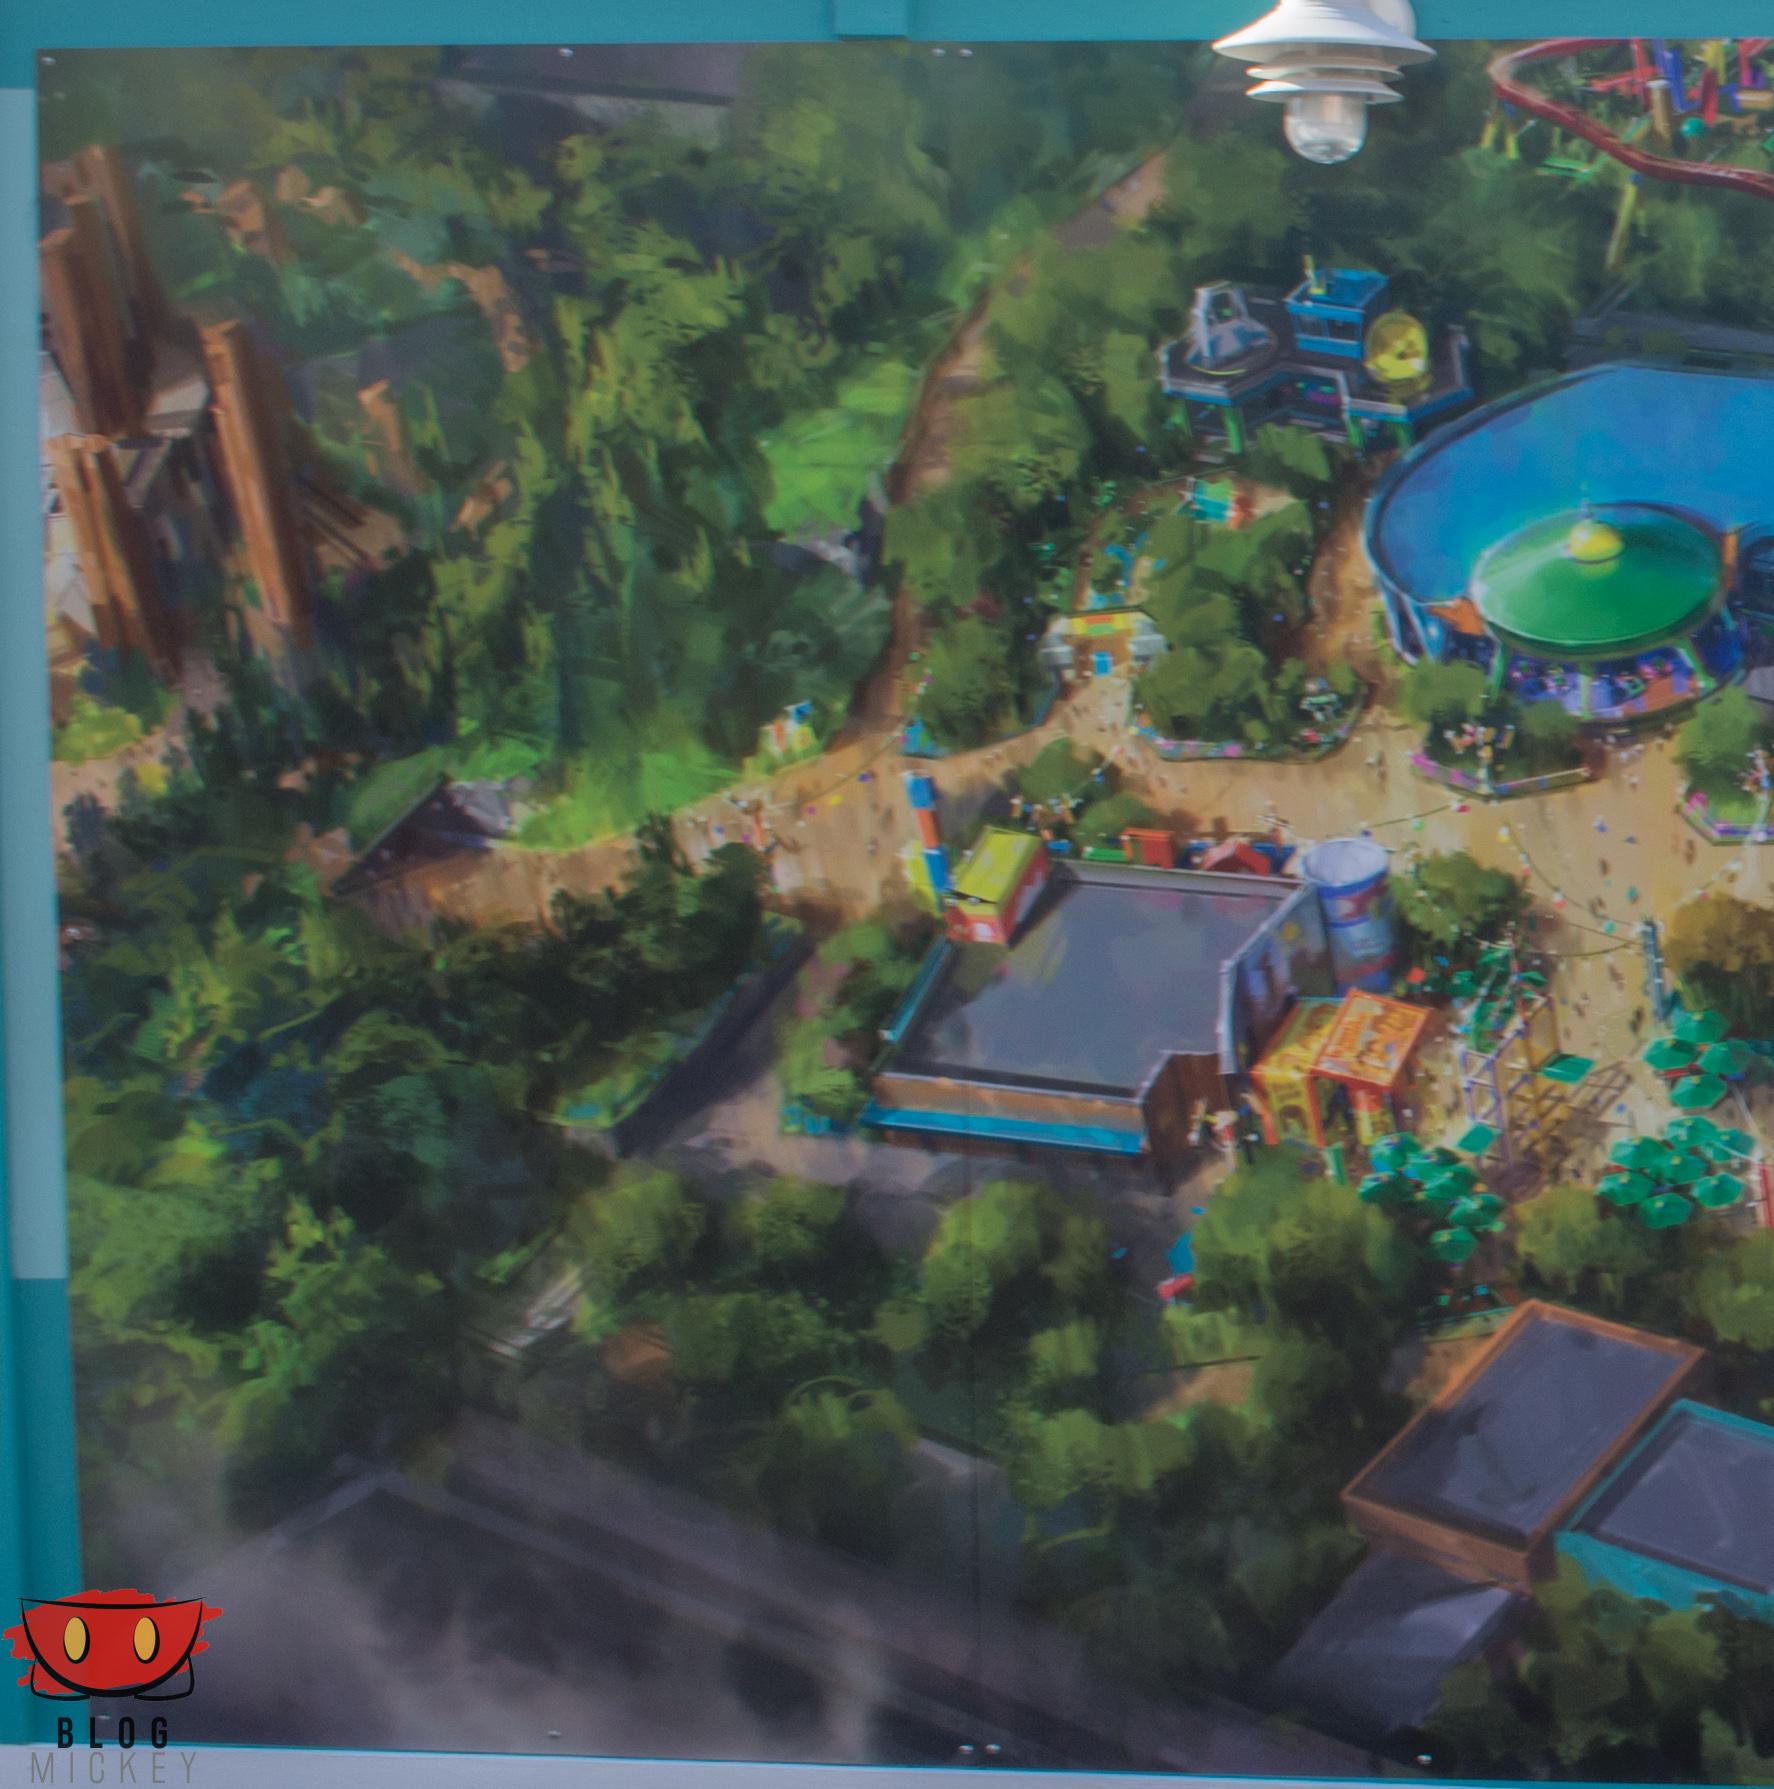 [Disney's Hollywood Studios] Toy Story Land (30 juin 2018) - Page 3 ToyStoryLandWallConceptArt_04032016-3